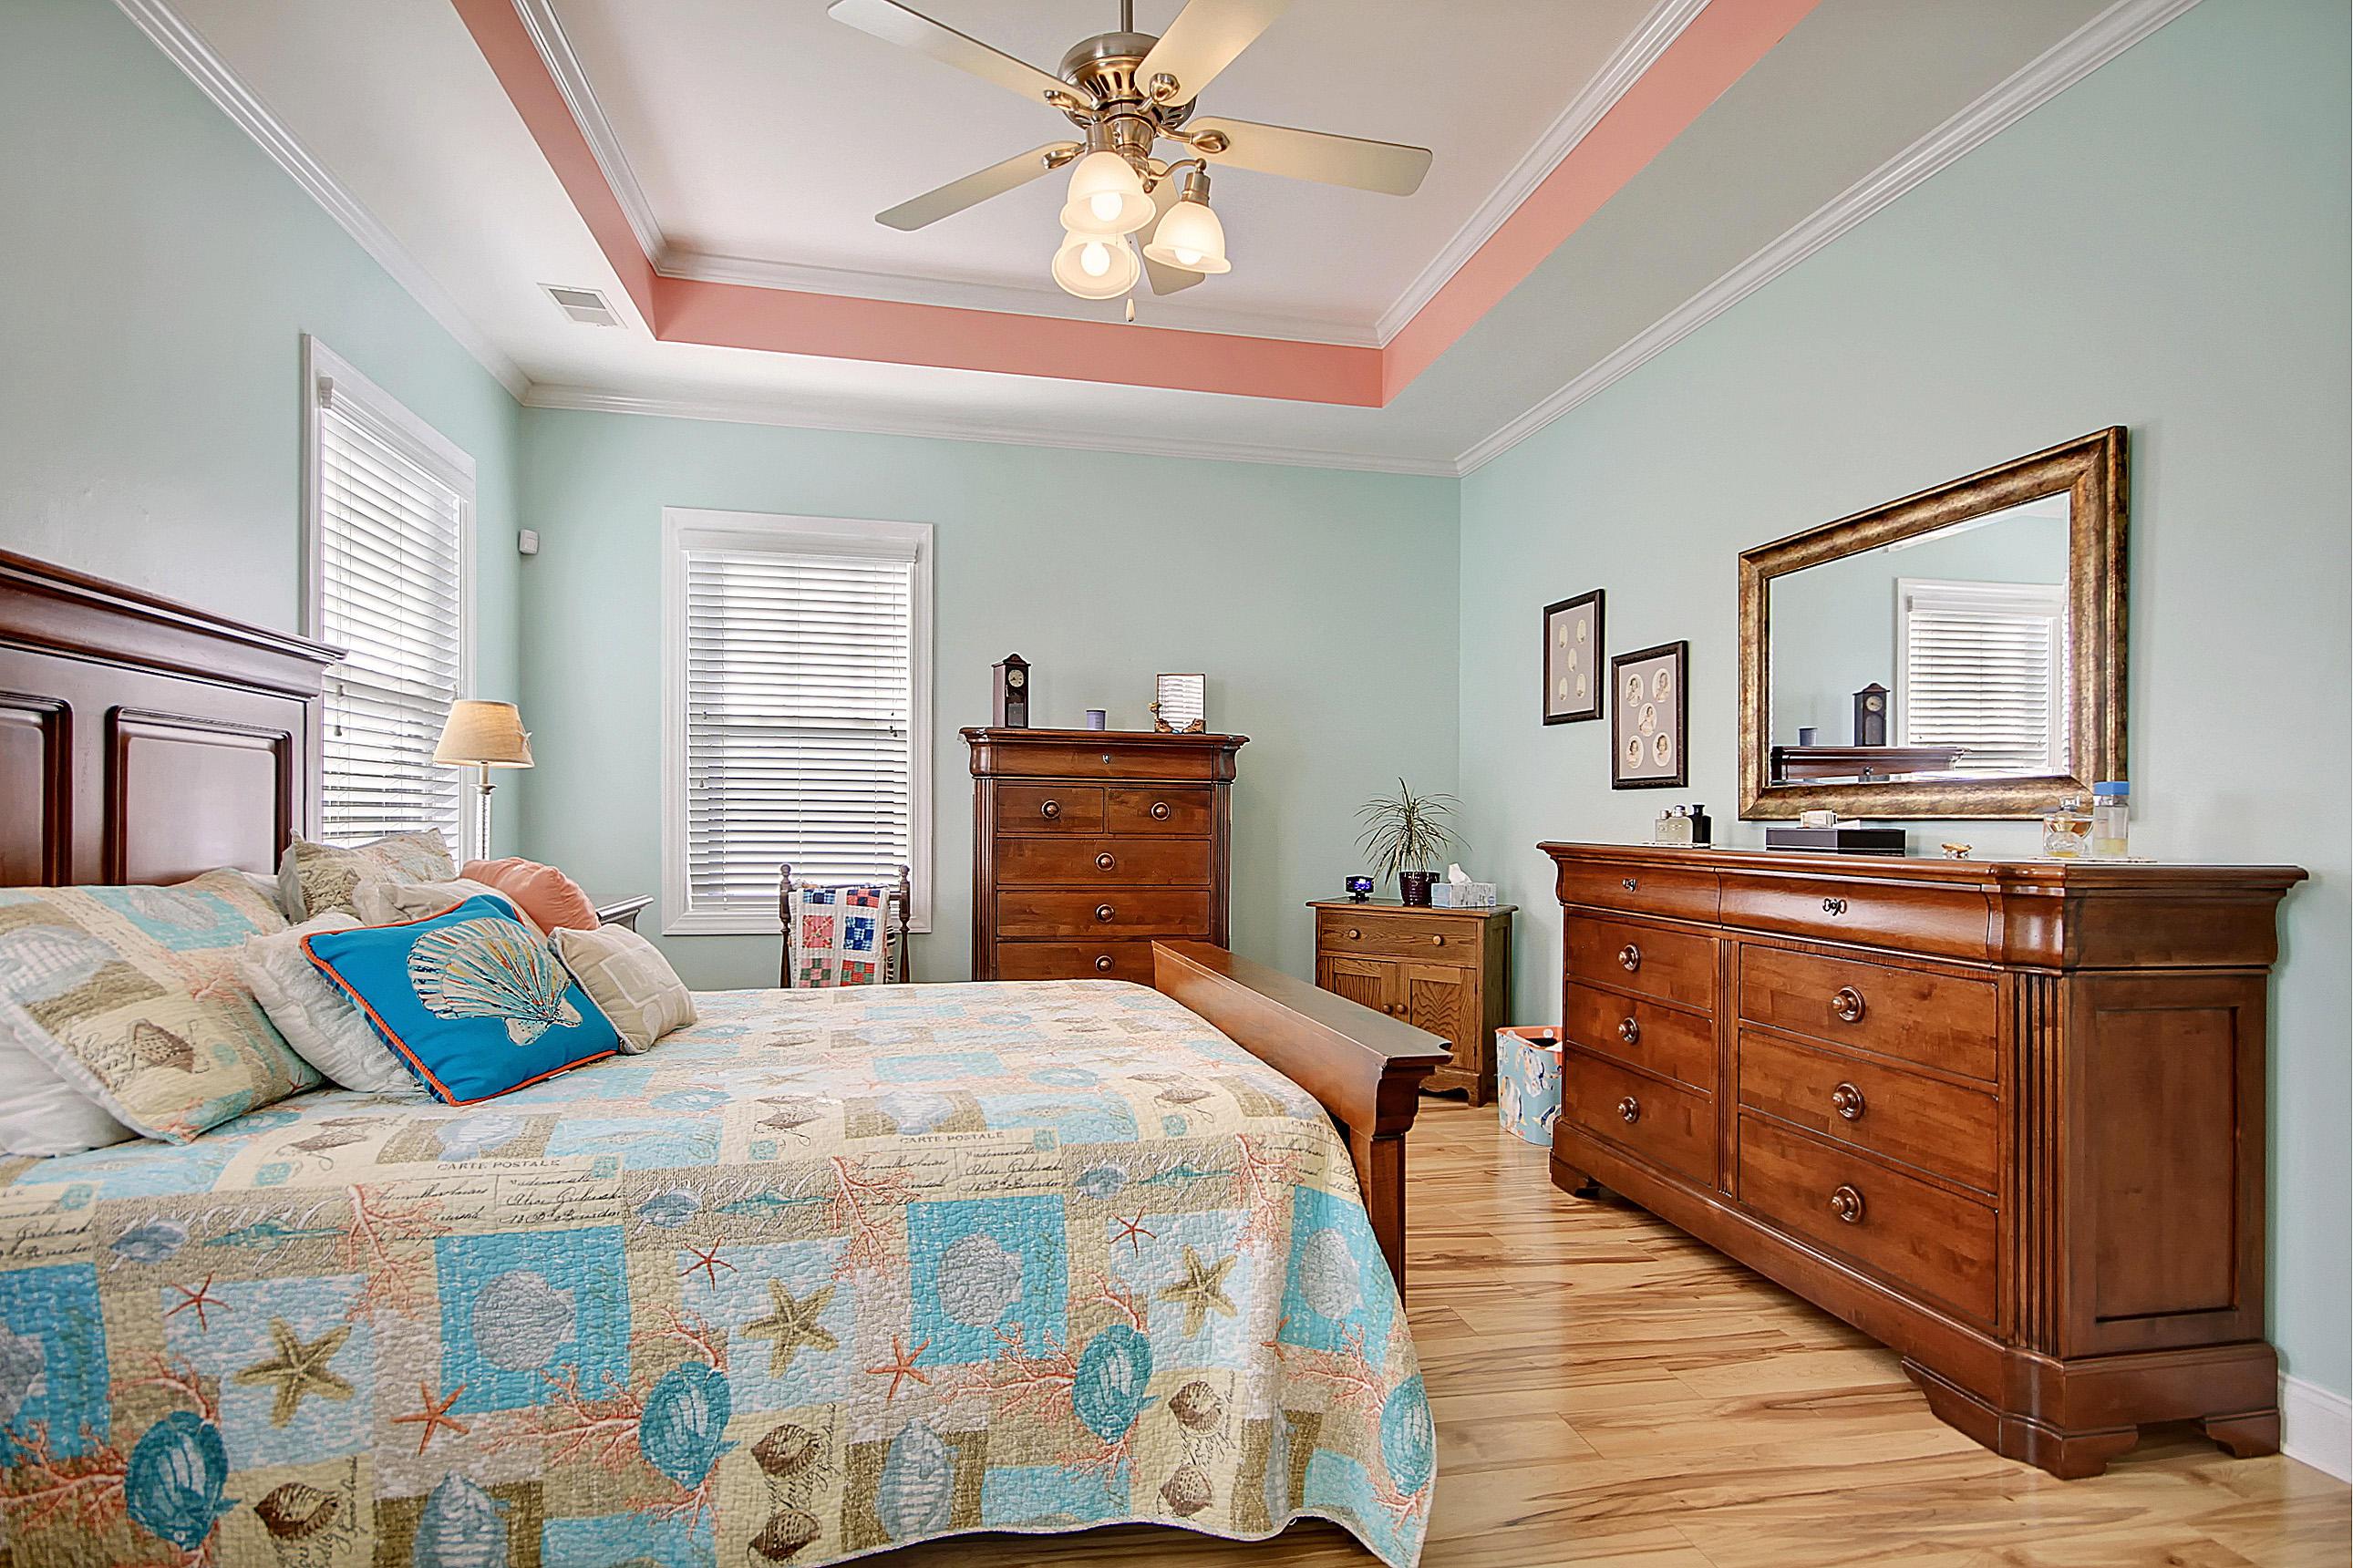 Indigo Palms Homes For Sale - 8535 Royal Palms, North Charleston, SC - 4